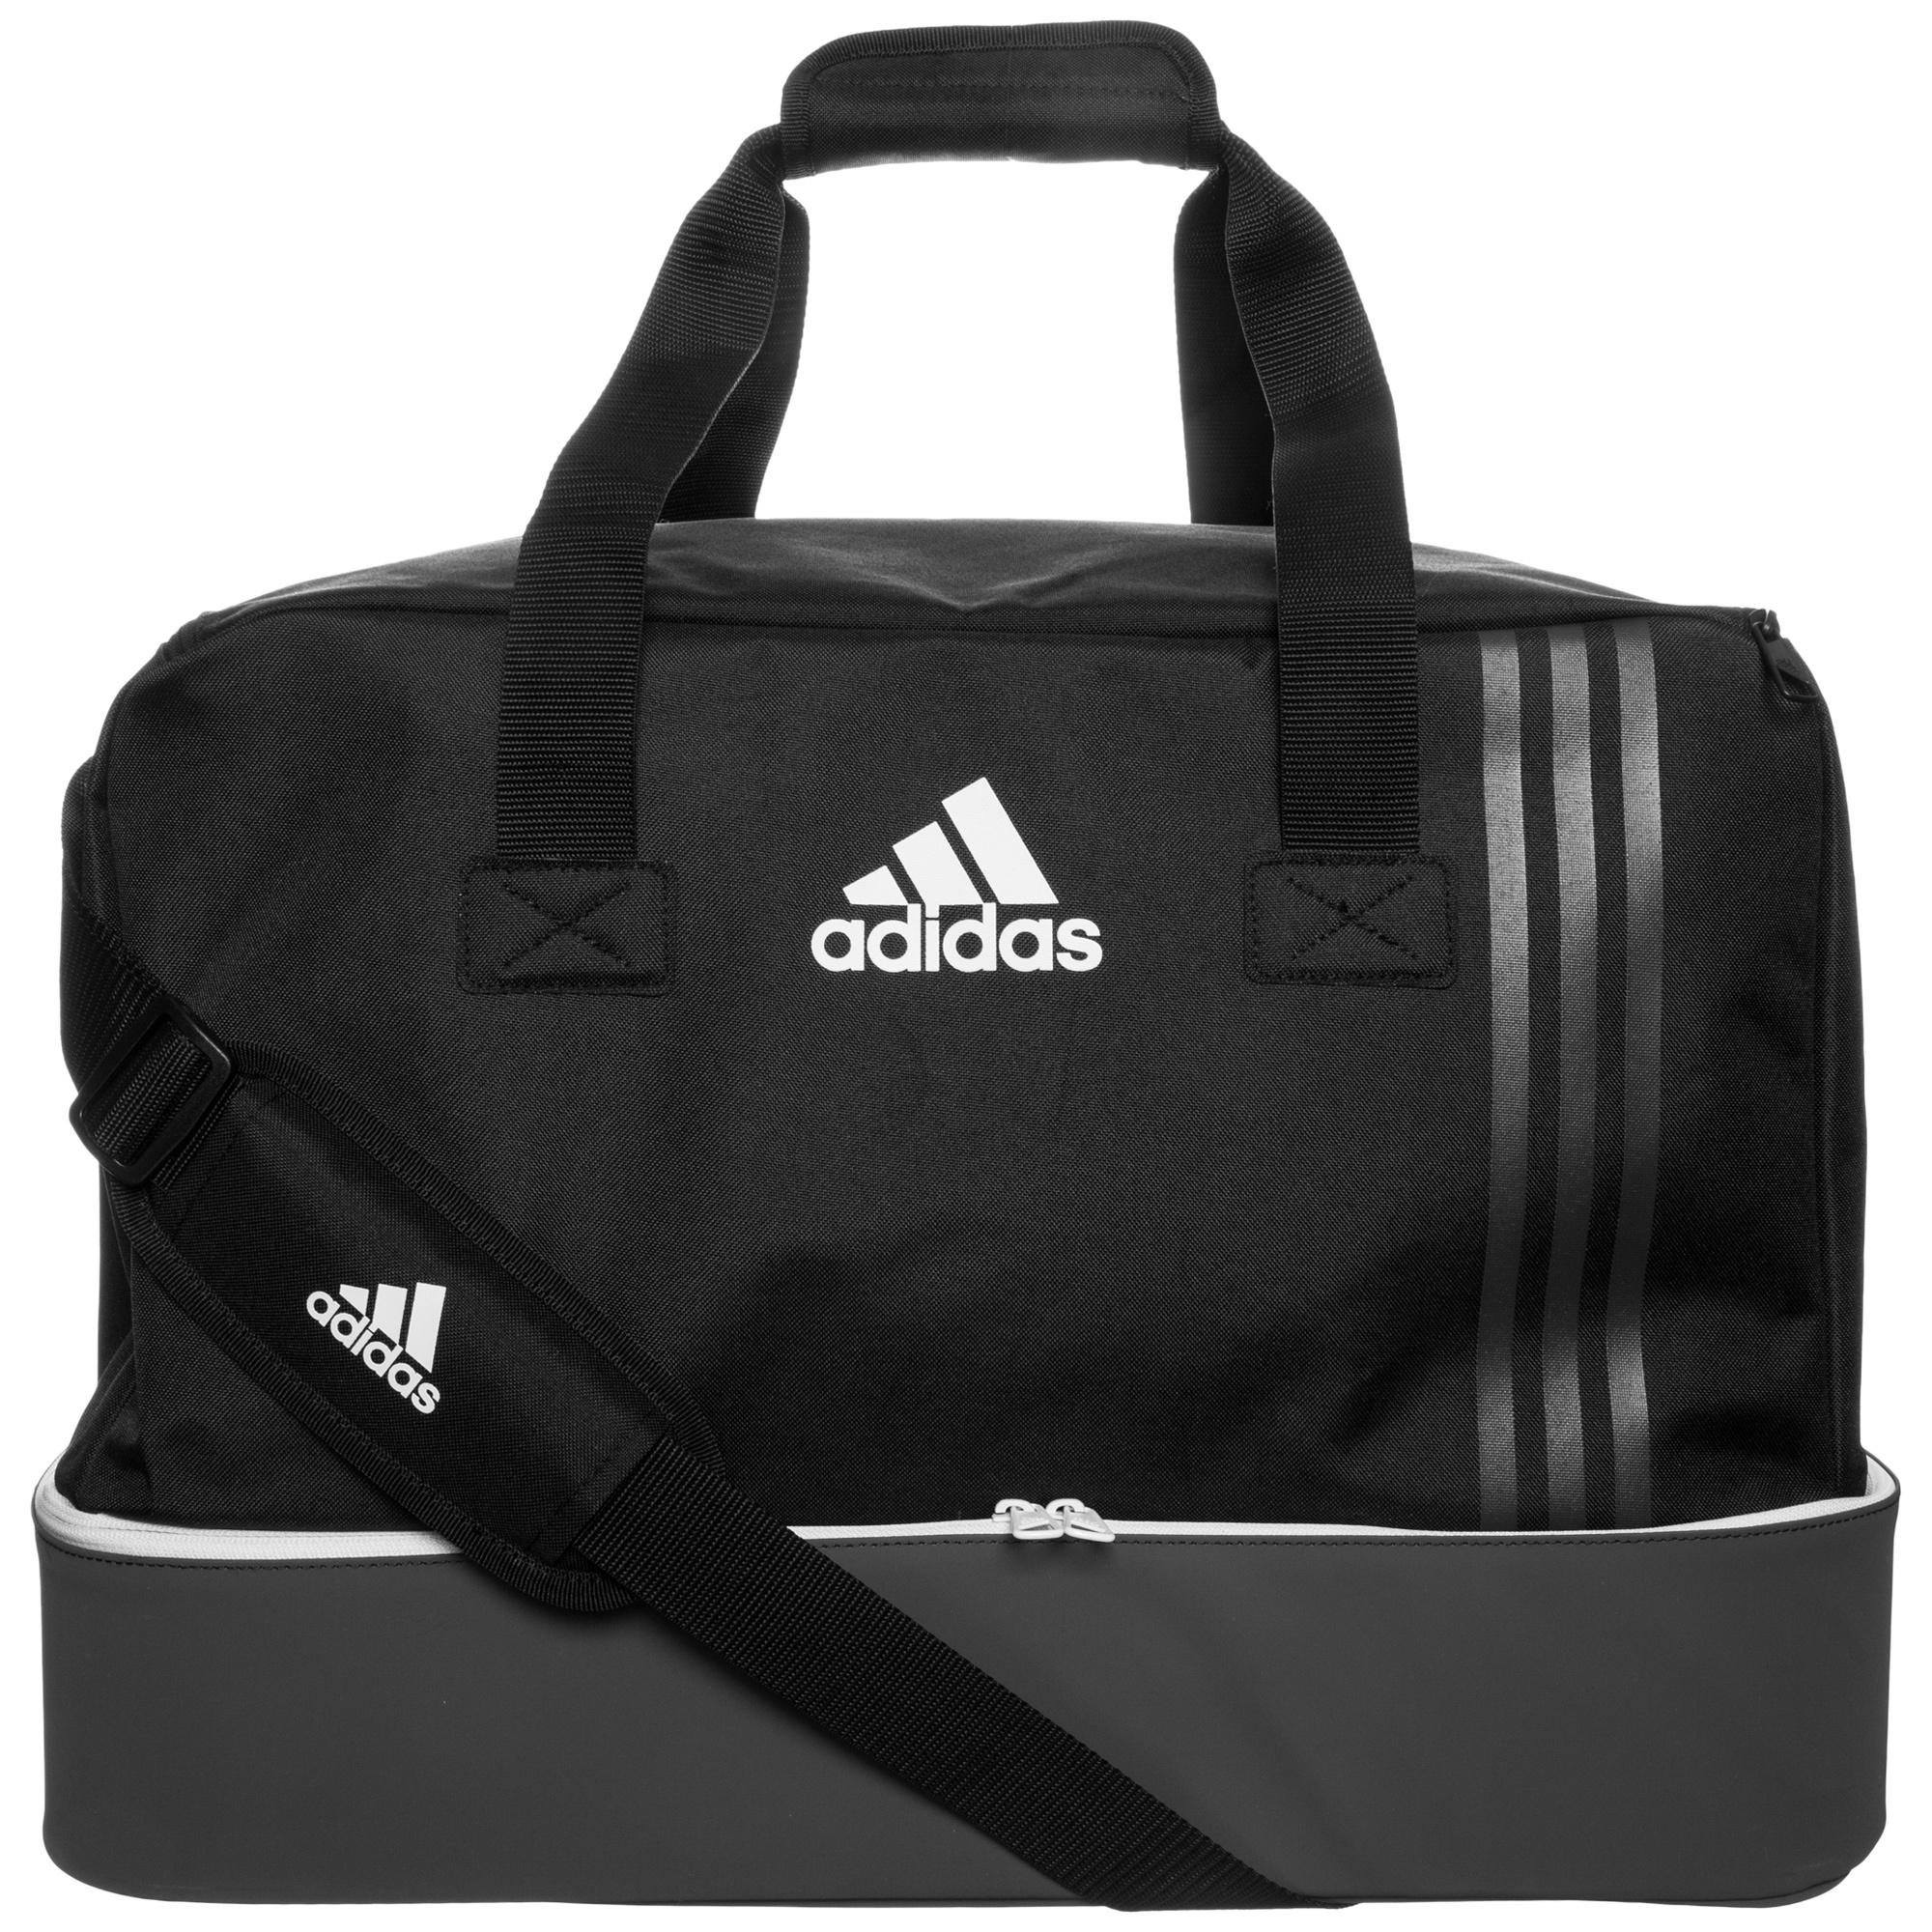 da0623fce82a7 adidas Tiro Team Bag BC Large Black Dark Grey White